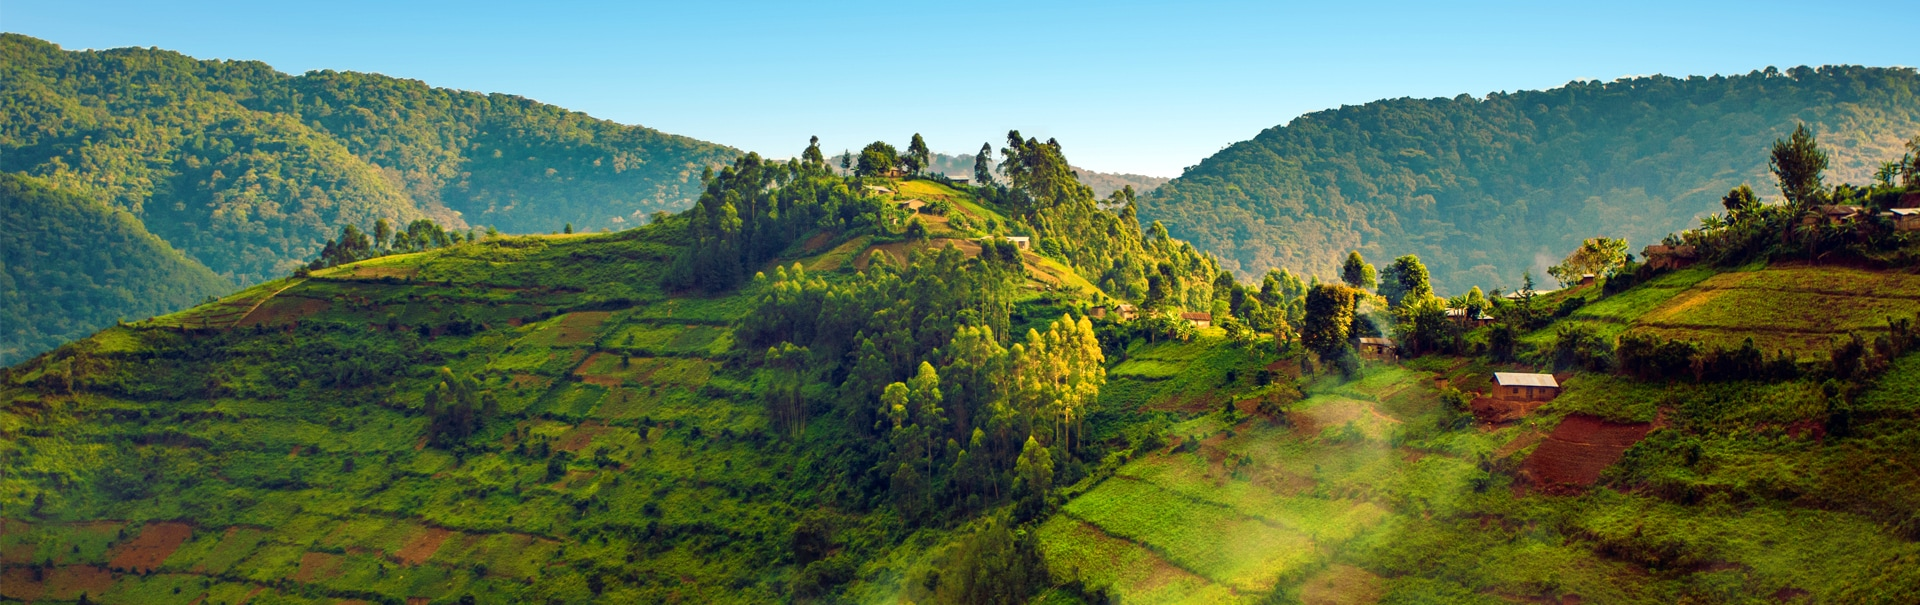 Uganda Rwanda Kenya with Gorilla Trekking (AFRK) Banner